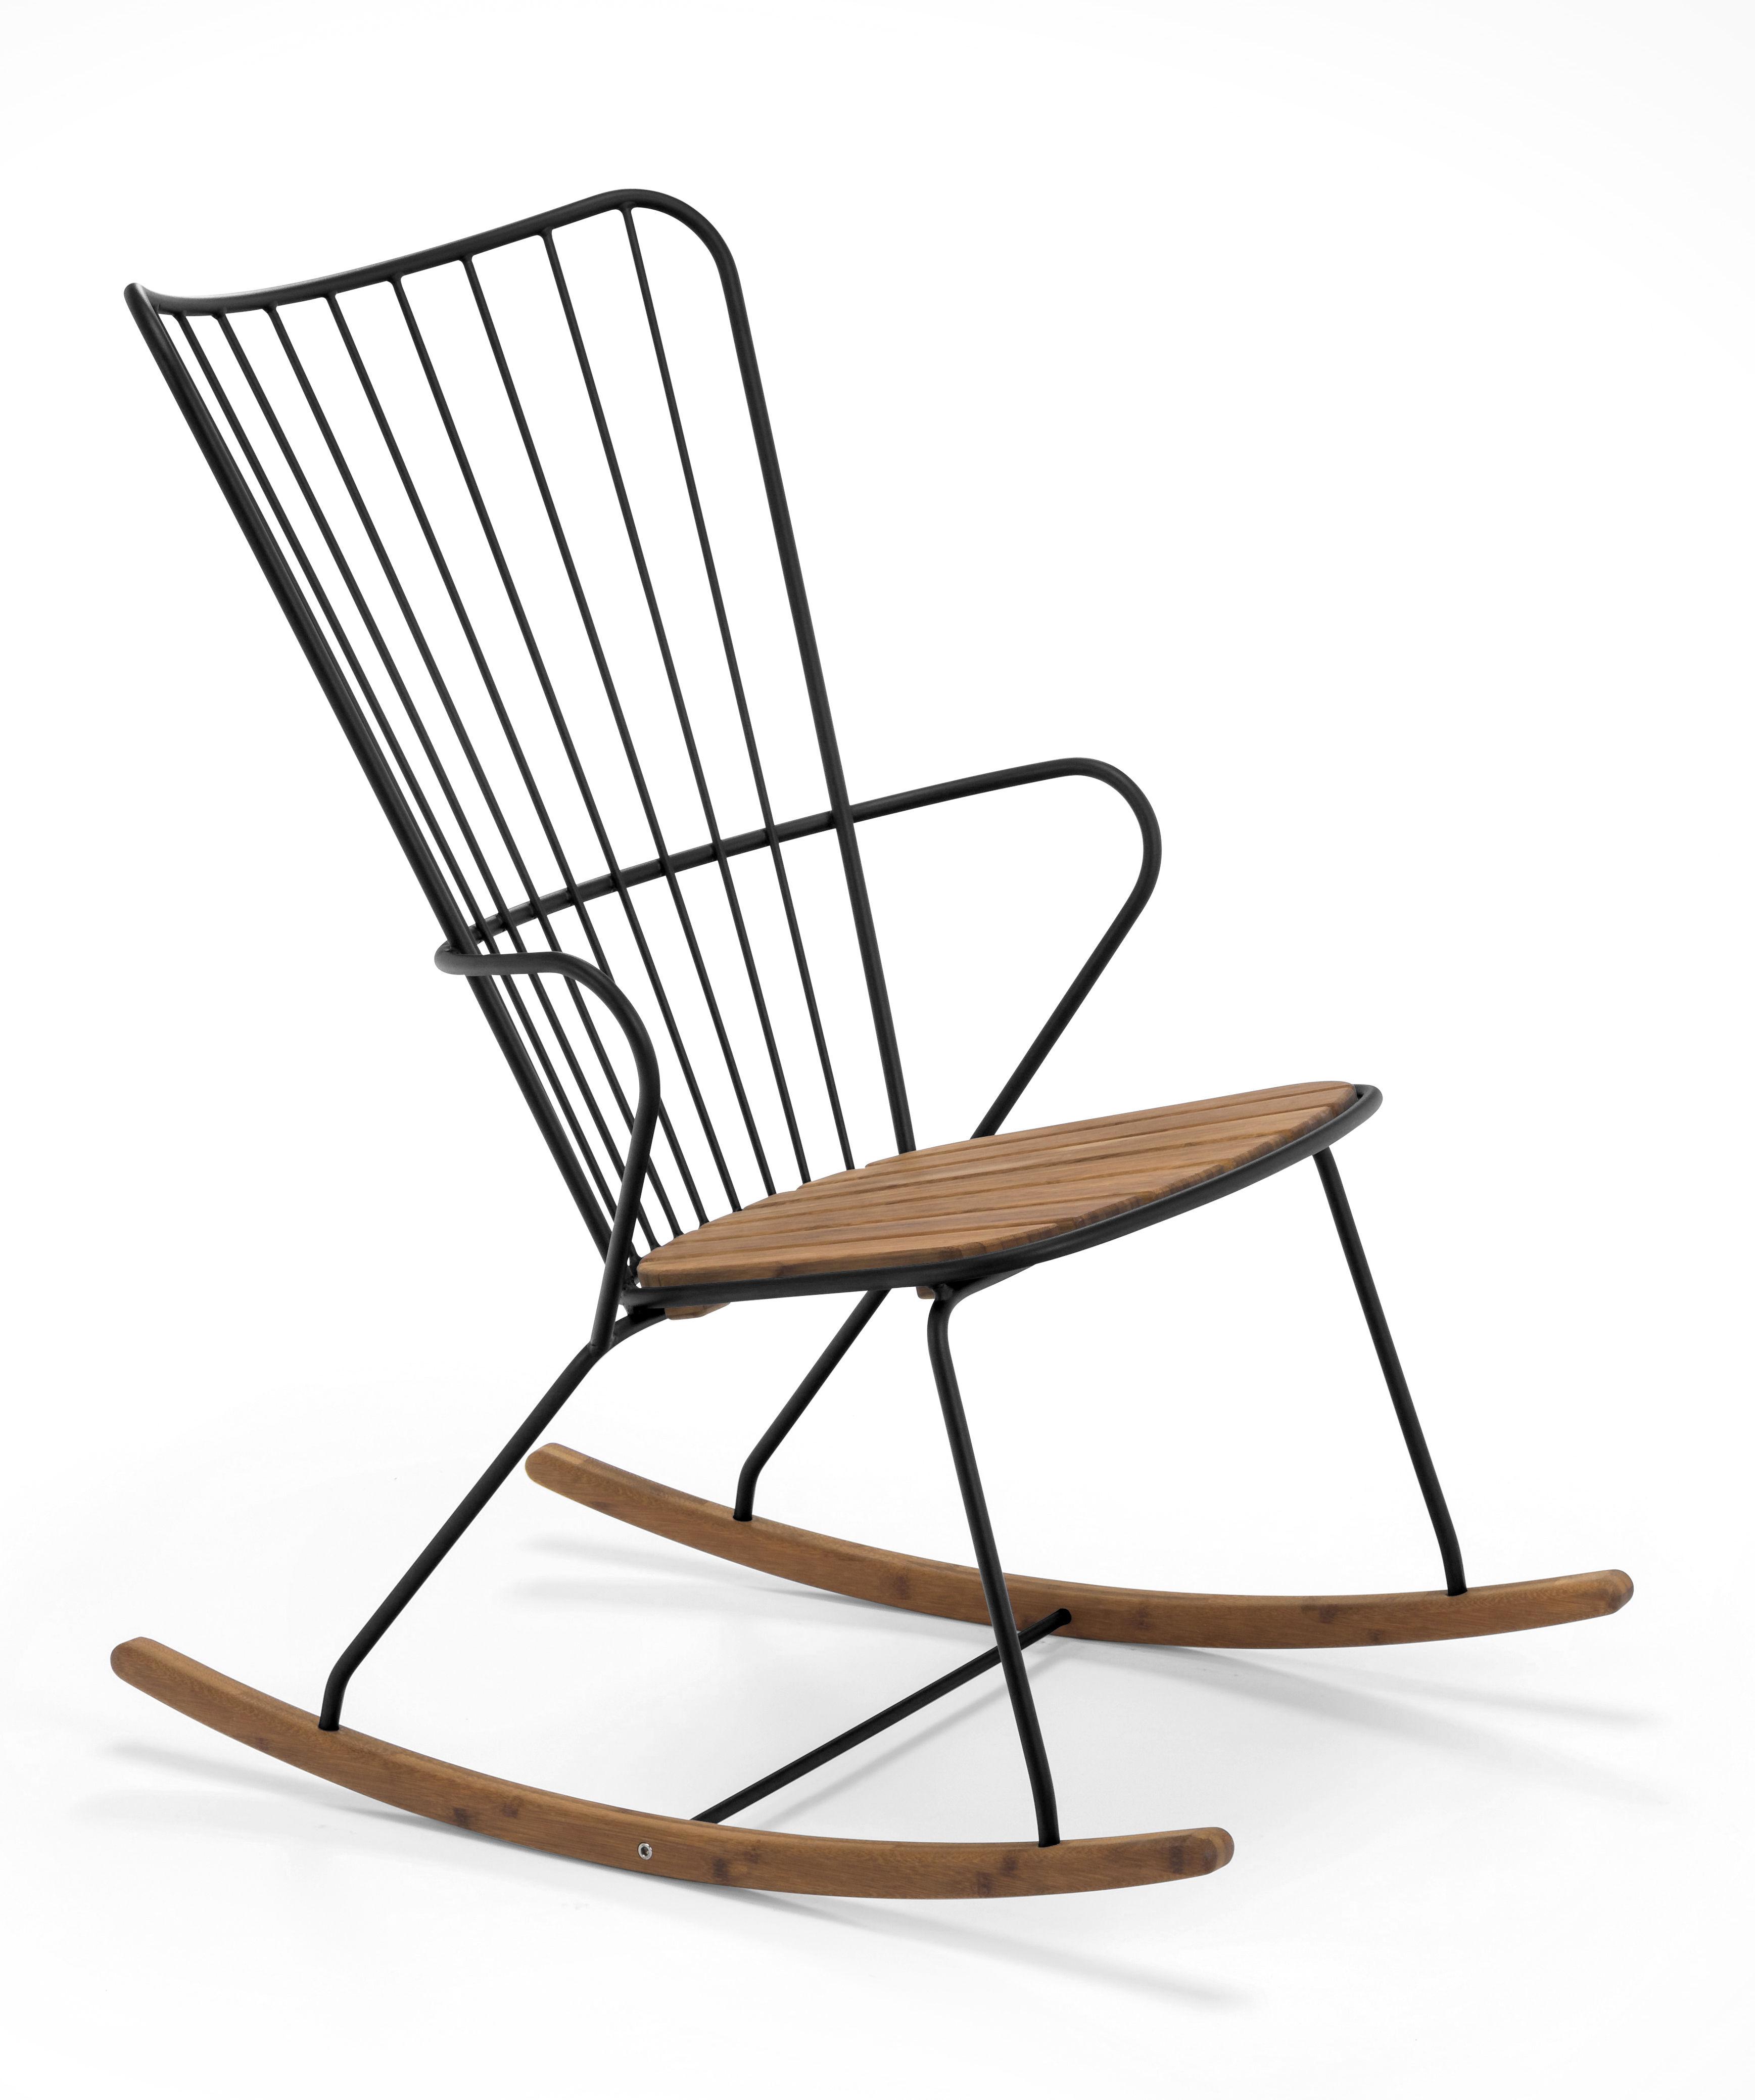 Dekoration - Dekorationsartikel - Paon Schaukelstuhl / Metall & Bambus - Houe - Schwarz - Acier revêtement poudre, Bambus